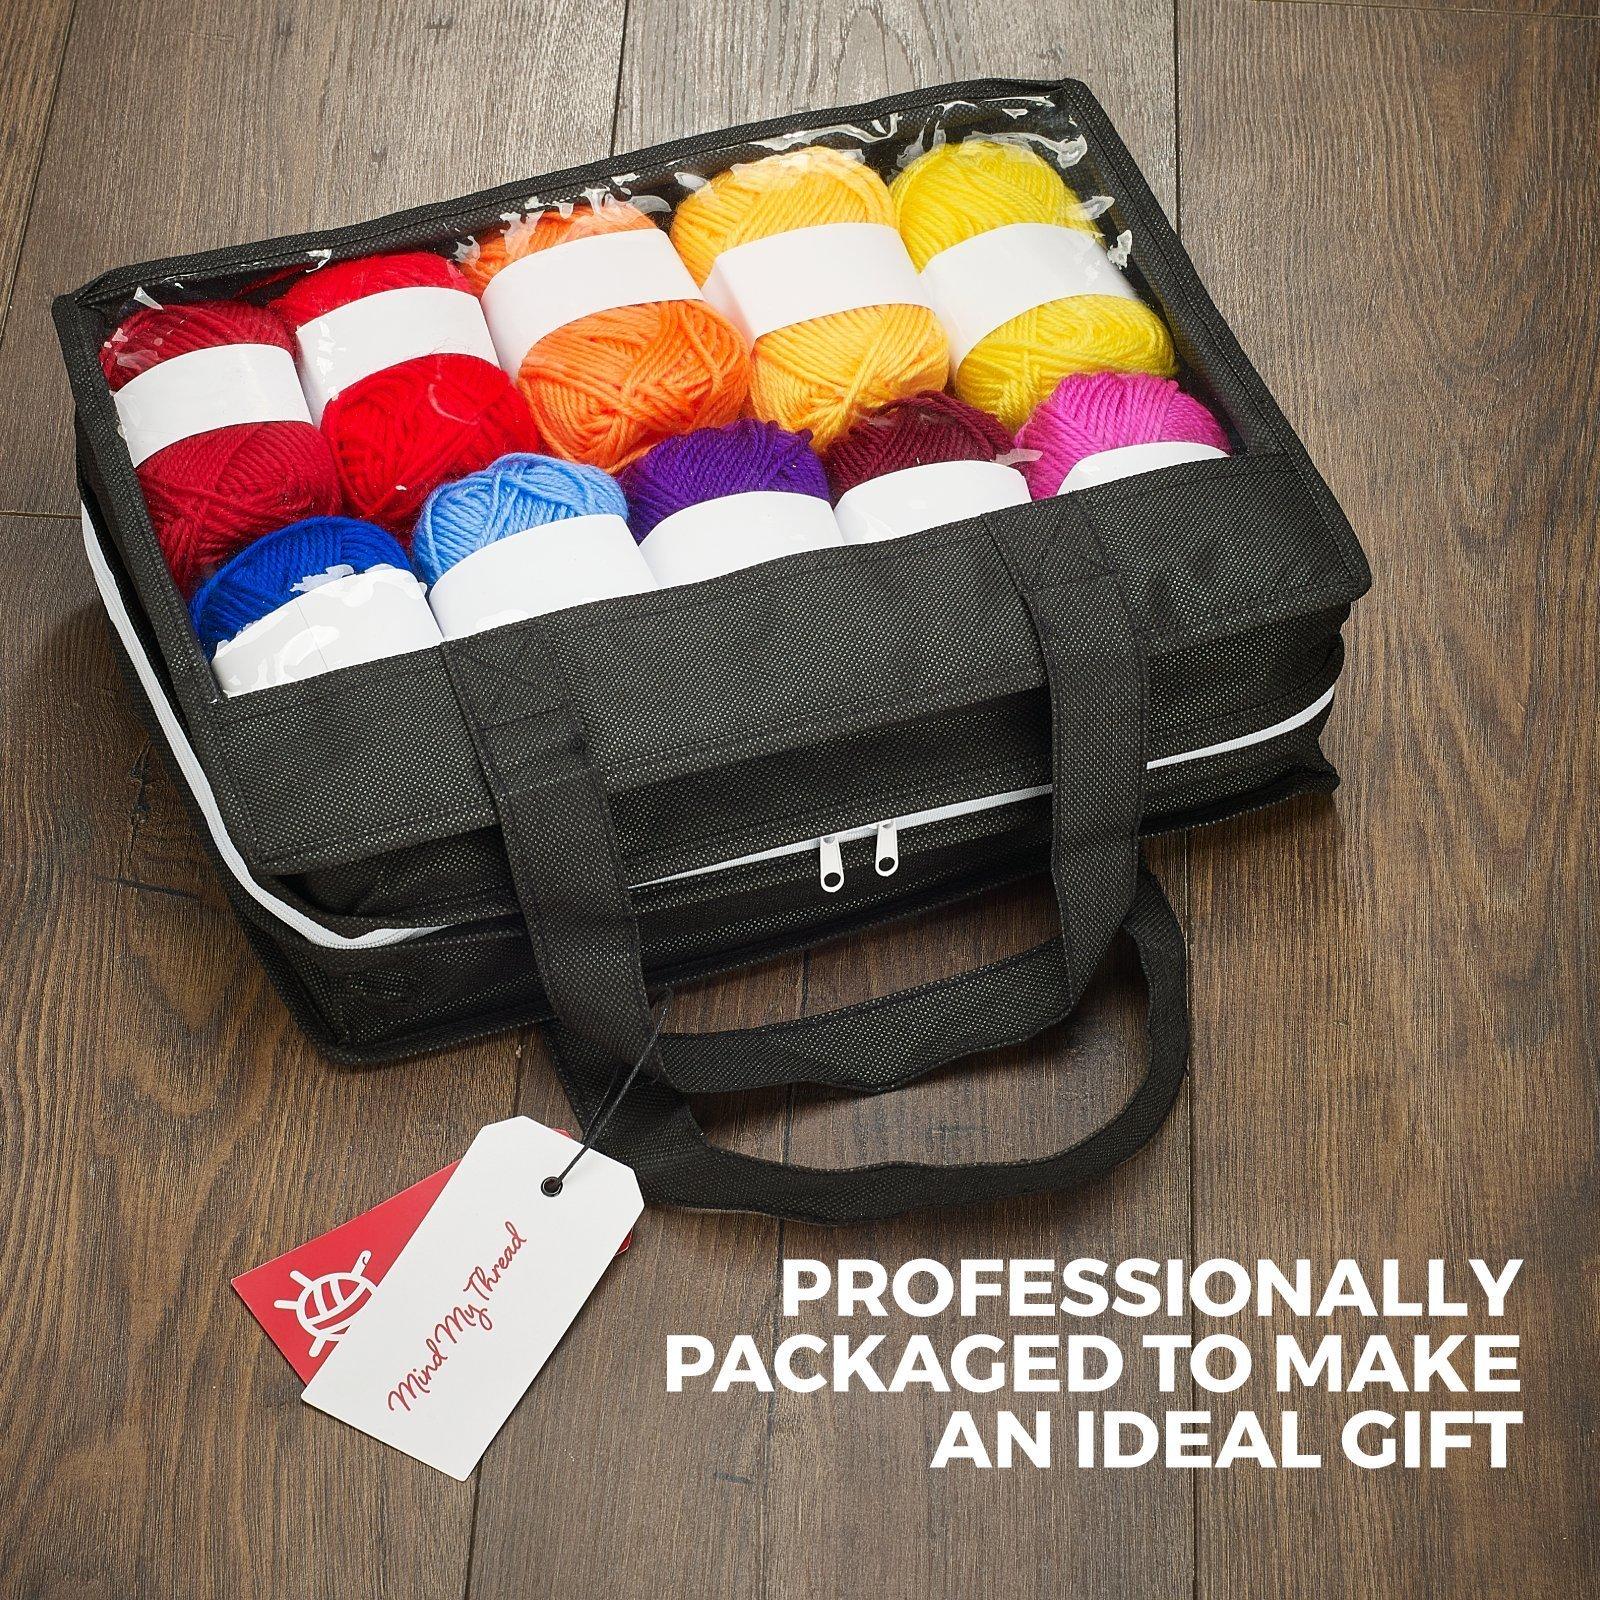 Mind My Thread 20 Super Soft Acrylic Yarn Skeins Set | Assorted Colors Crochet & Knitting Craft Yarn Kit with Reusable Storage Bag & Bonus Crochet Hook | 20 Colors Yarn Multi Pack by Mind My Thread (Image #5)